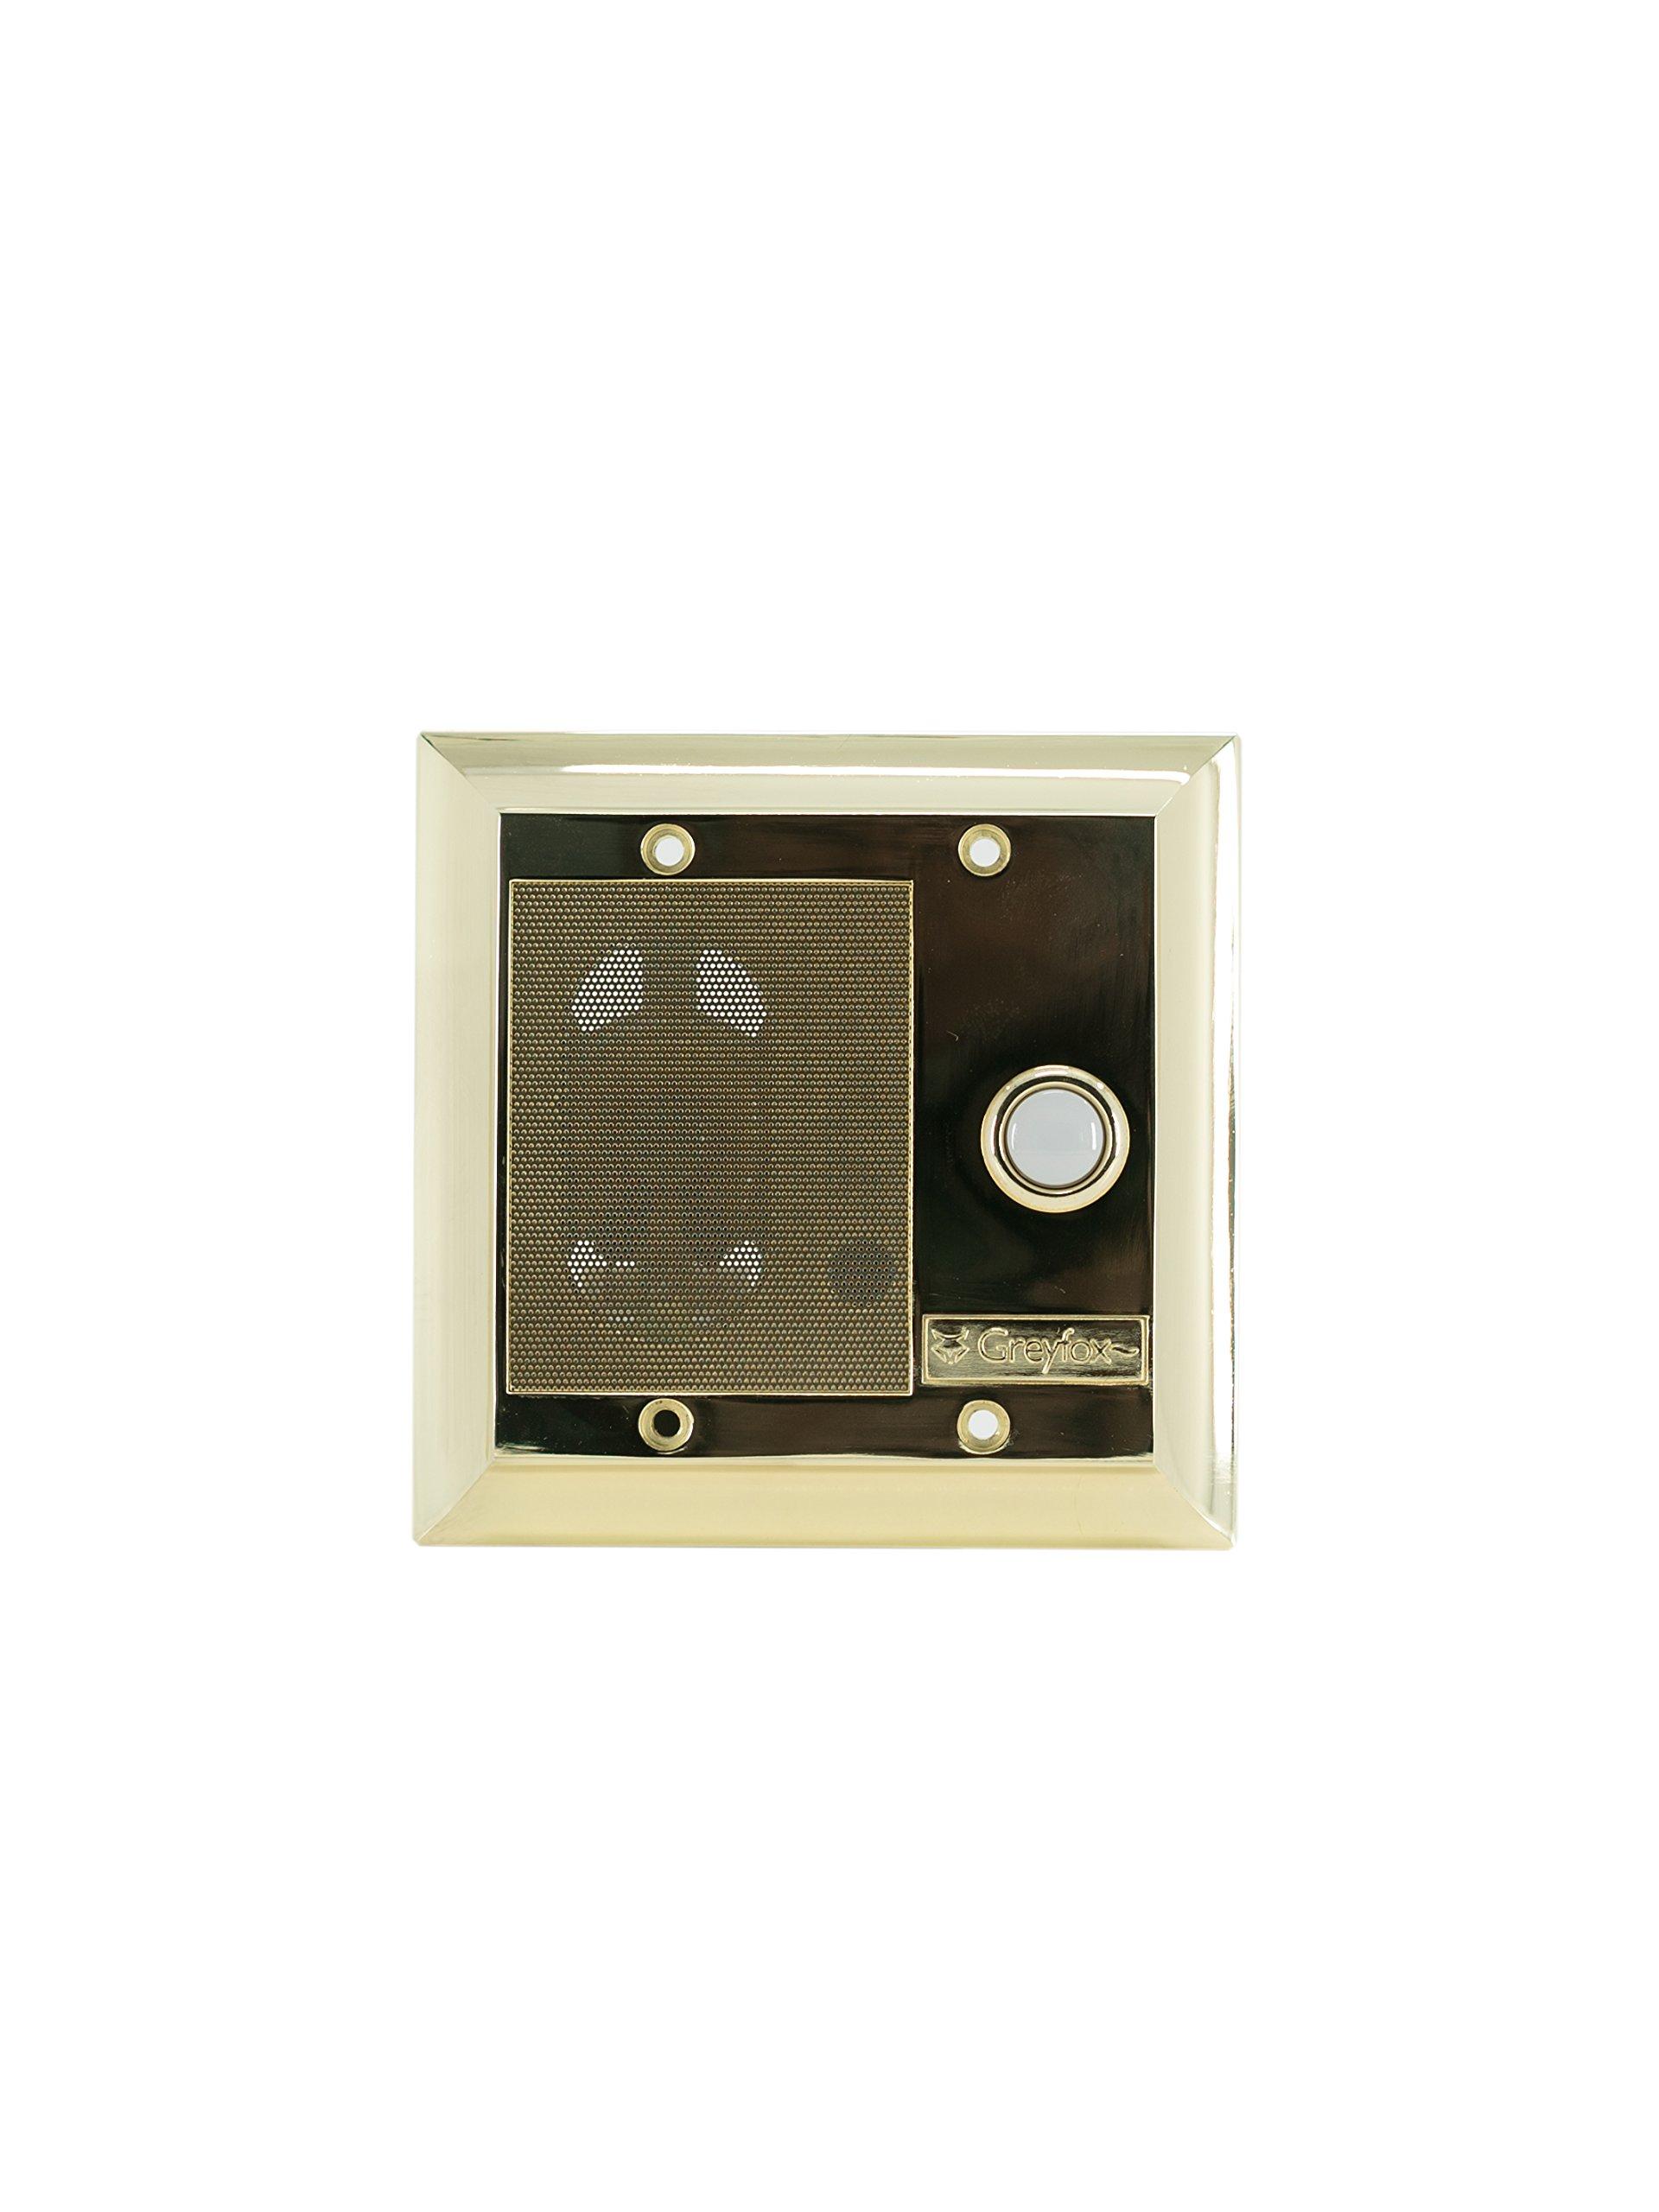 Legrand - On-Q F7596SB Intercom Door Unit, Weather Resistant, Shiny Brass